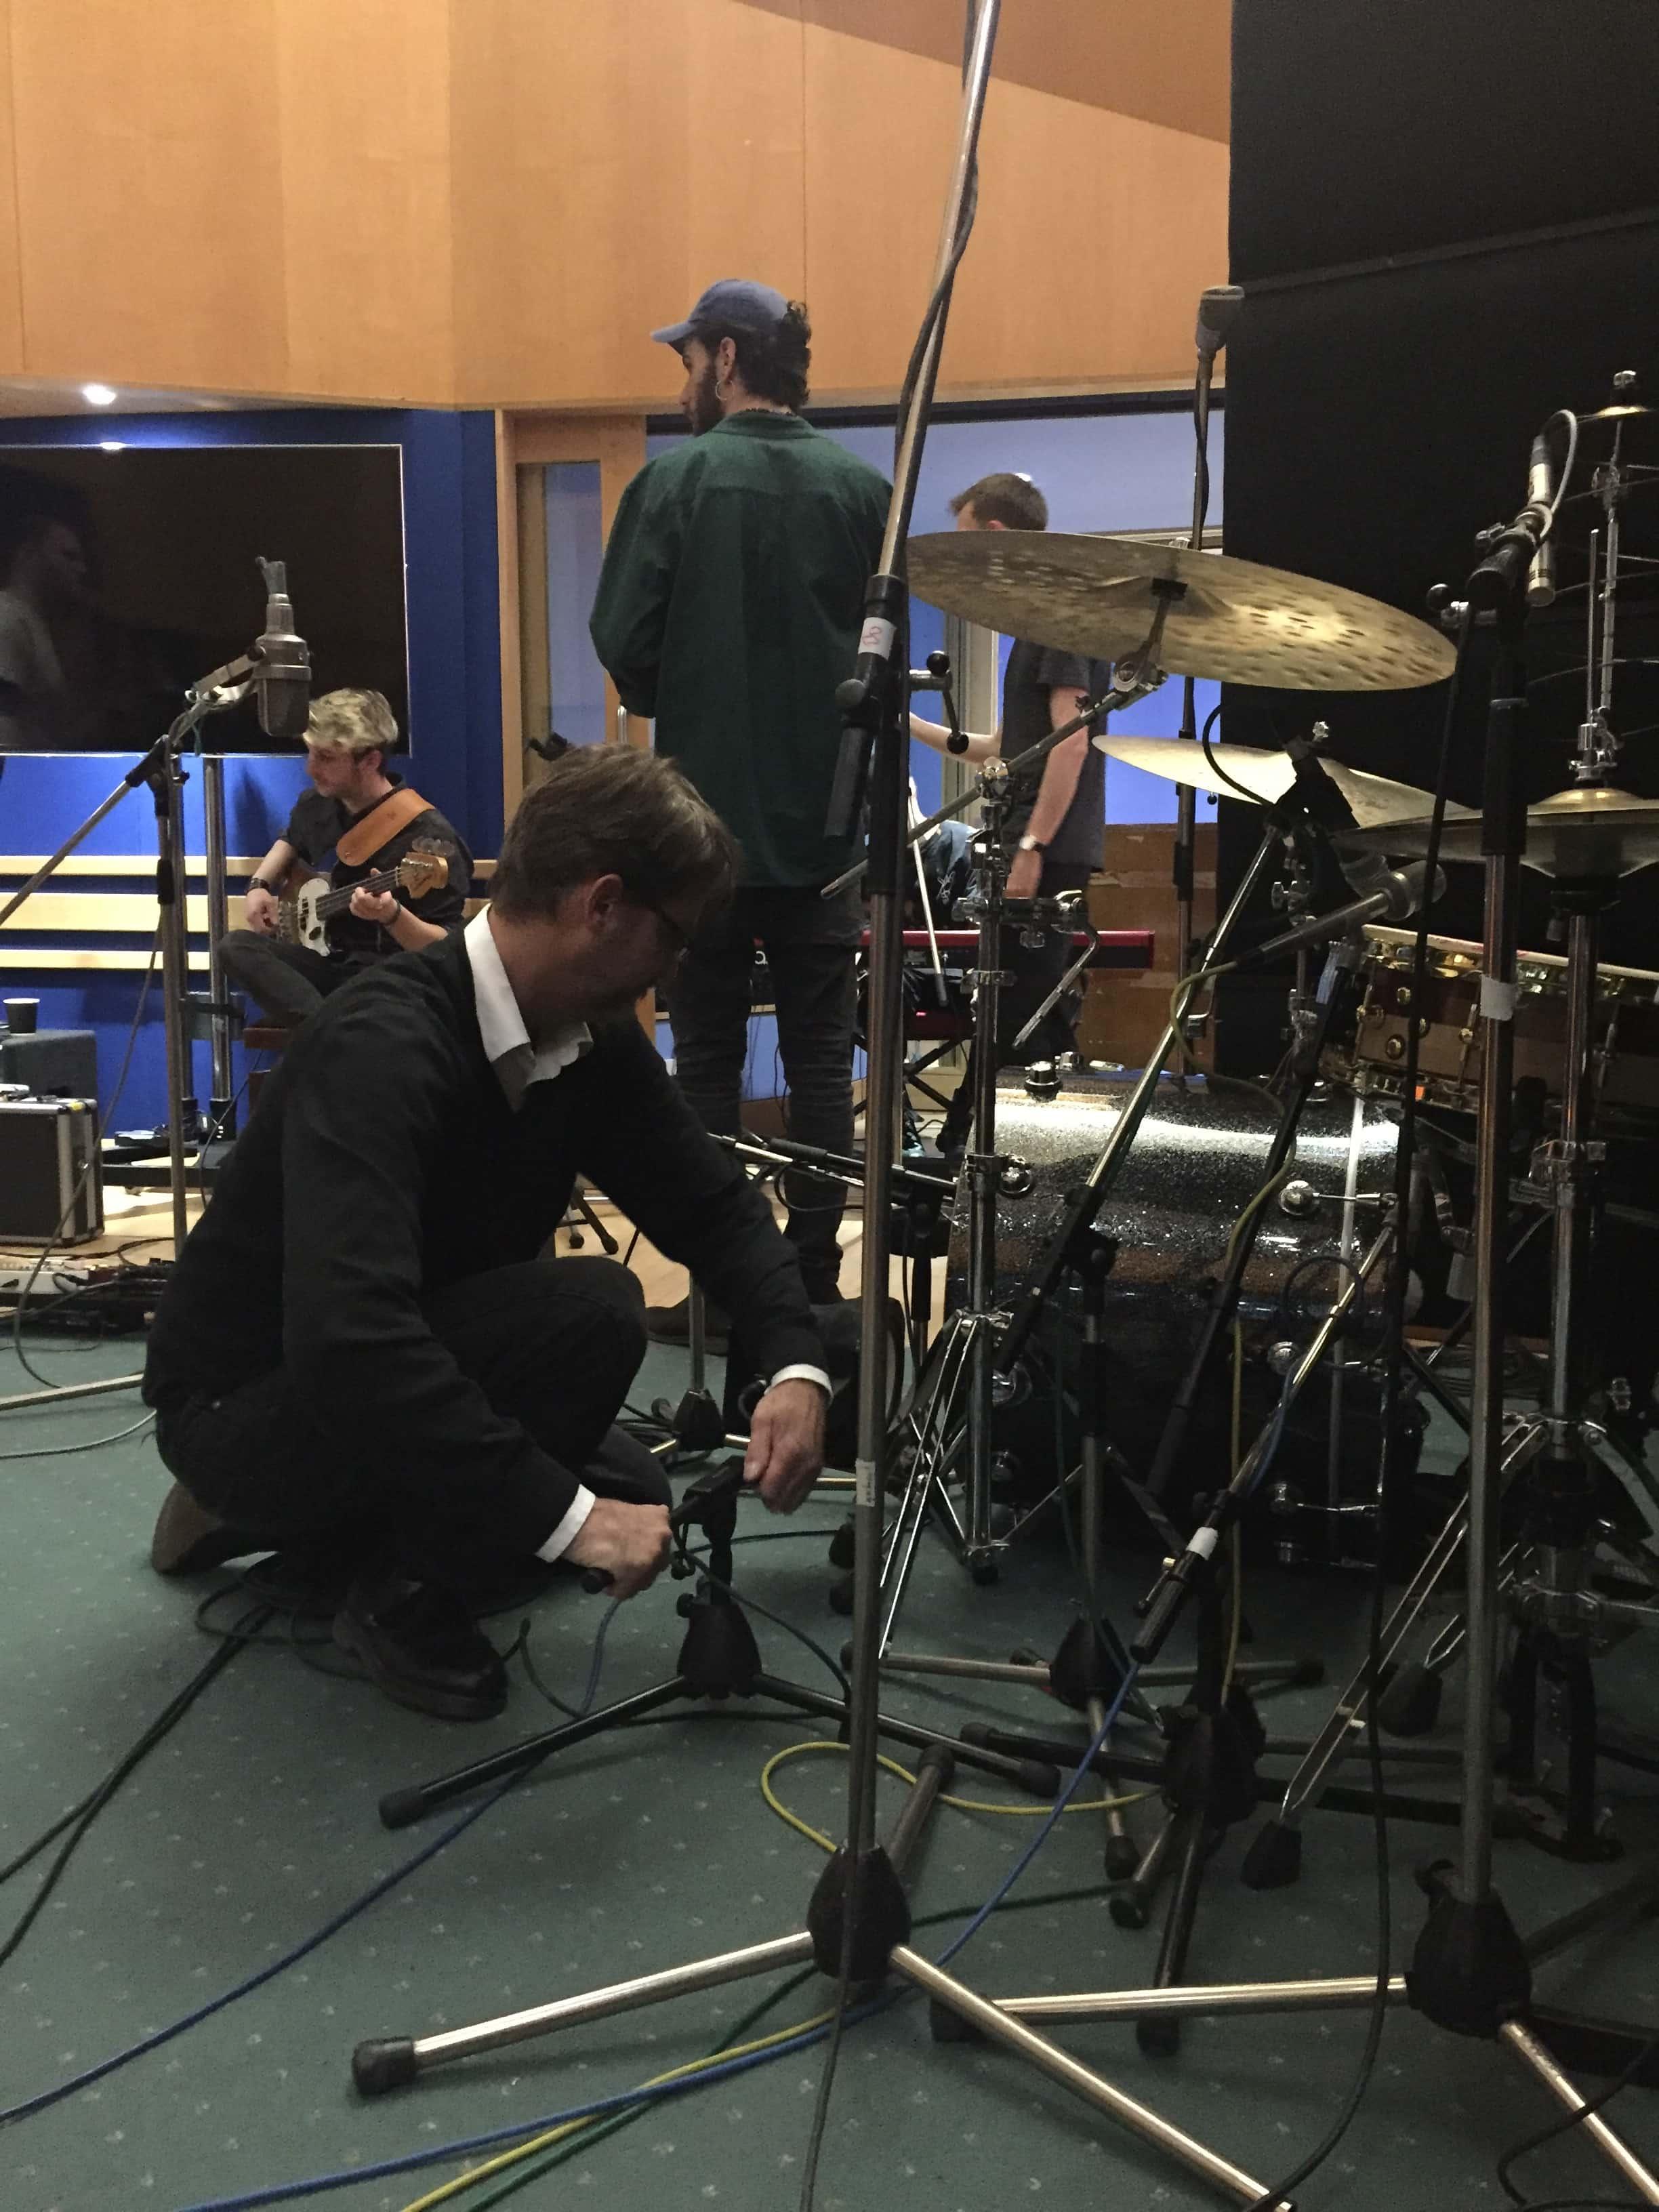 Carlos Lellis setting up the studio